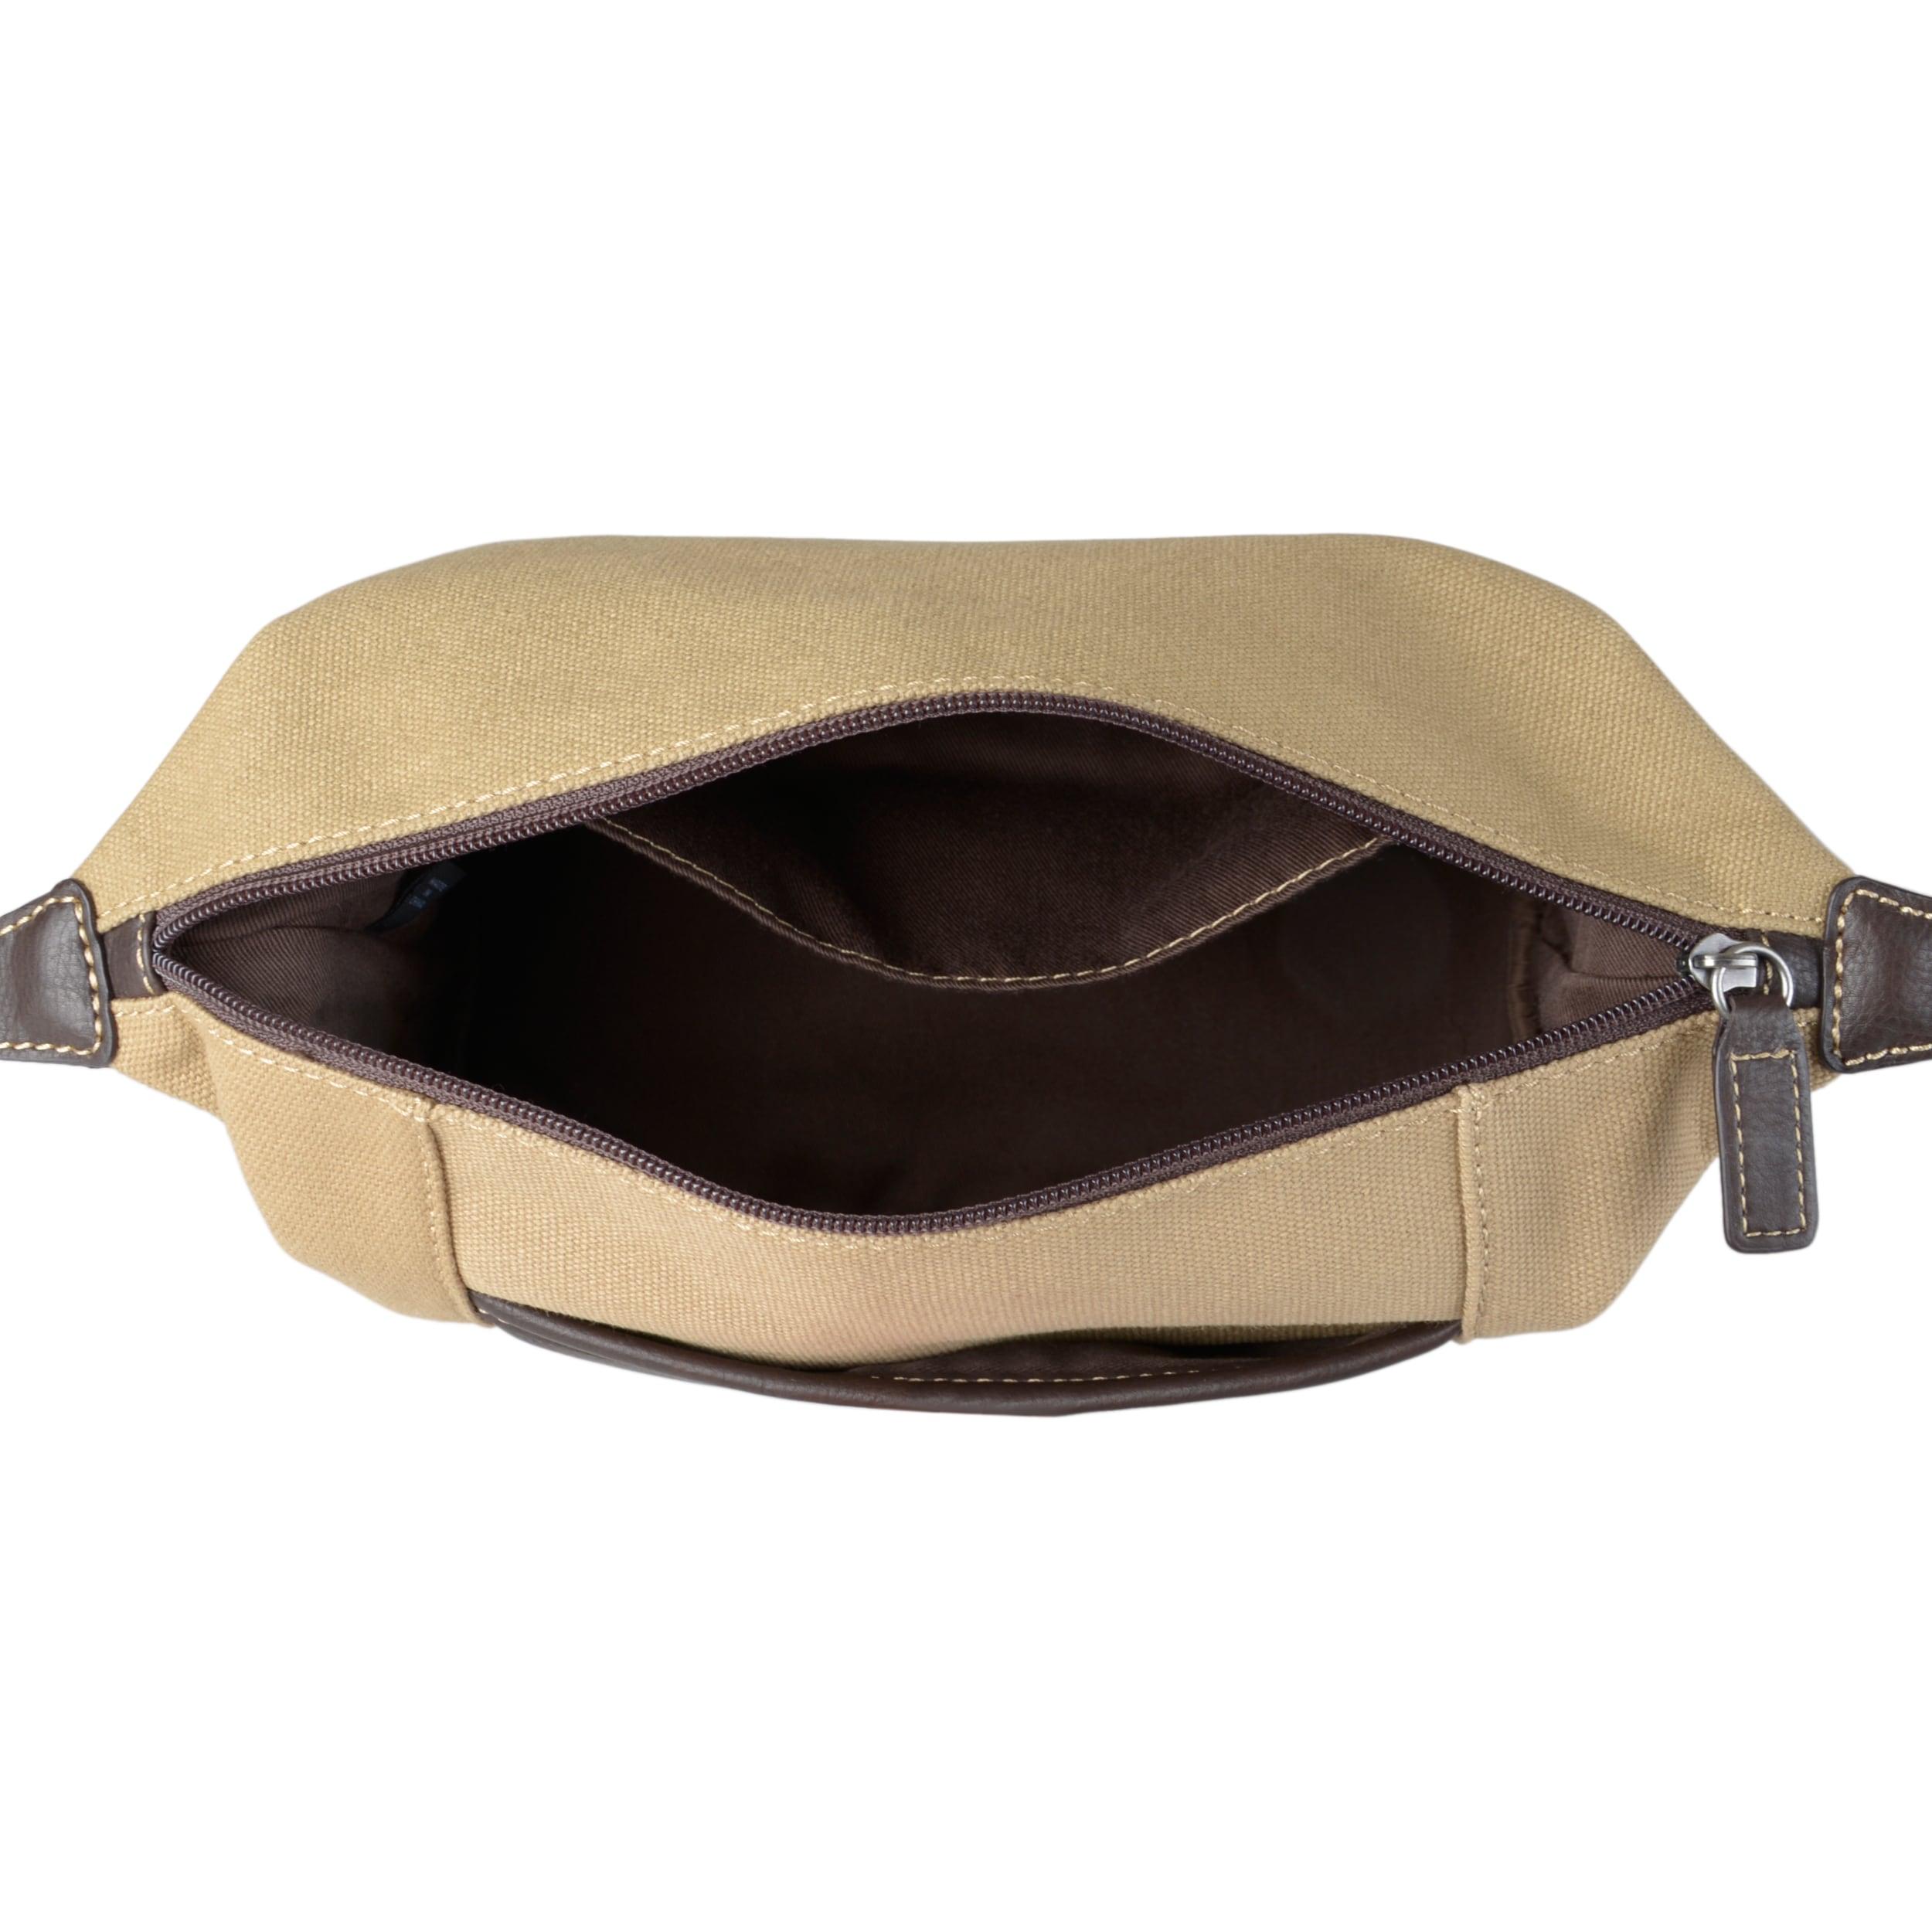 Shop Tommy Bahama Men s Toiletry Kit Dopp Bag - Free Shipping Today -  Overstock.com - 11634391 eaad8deb3a